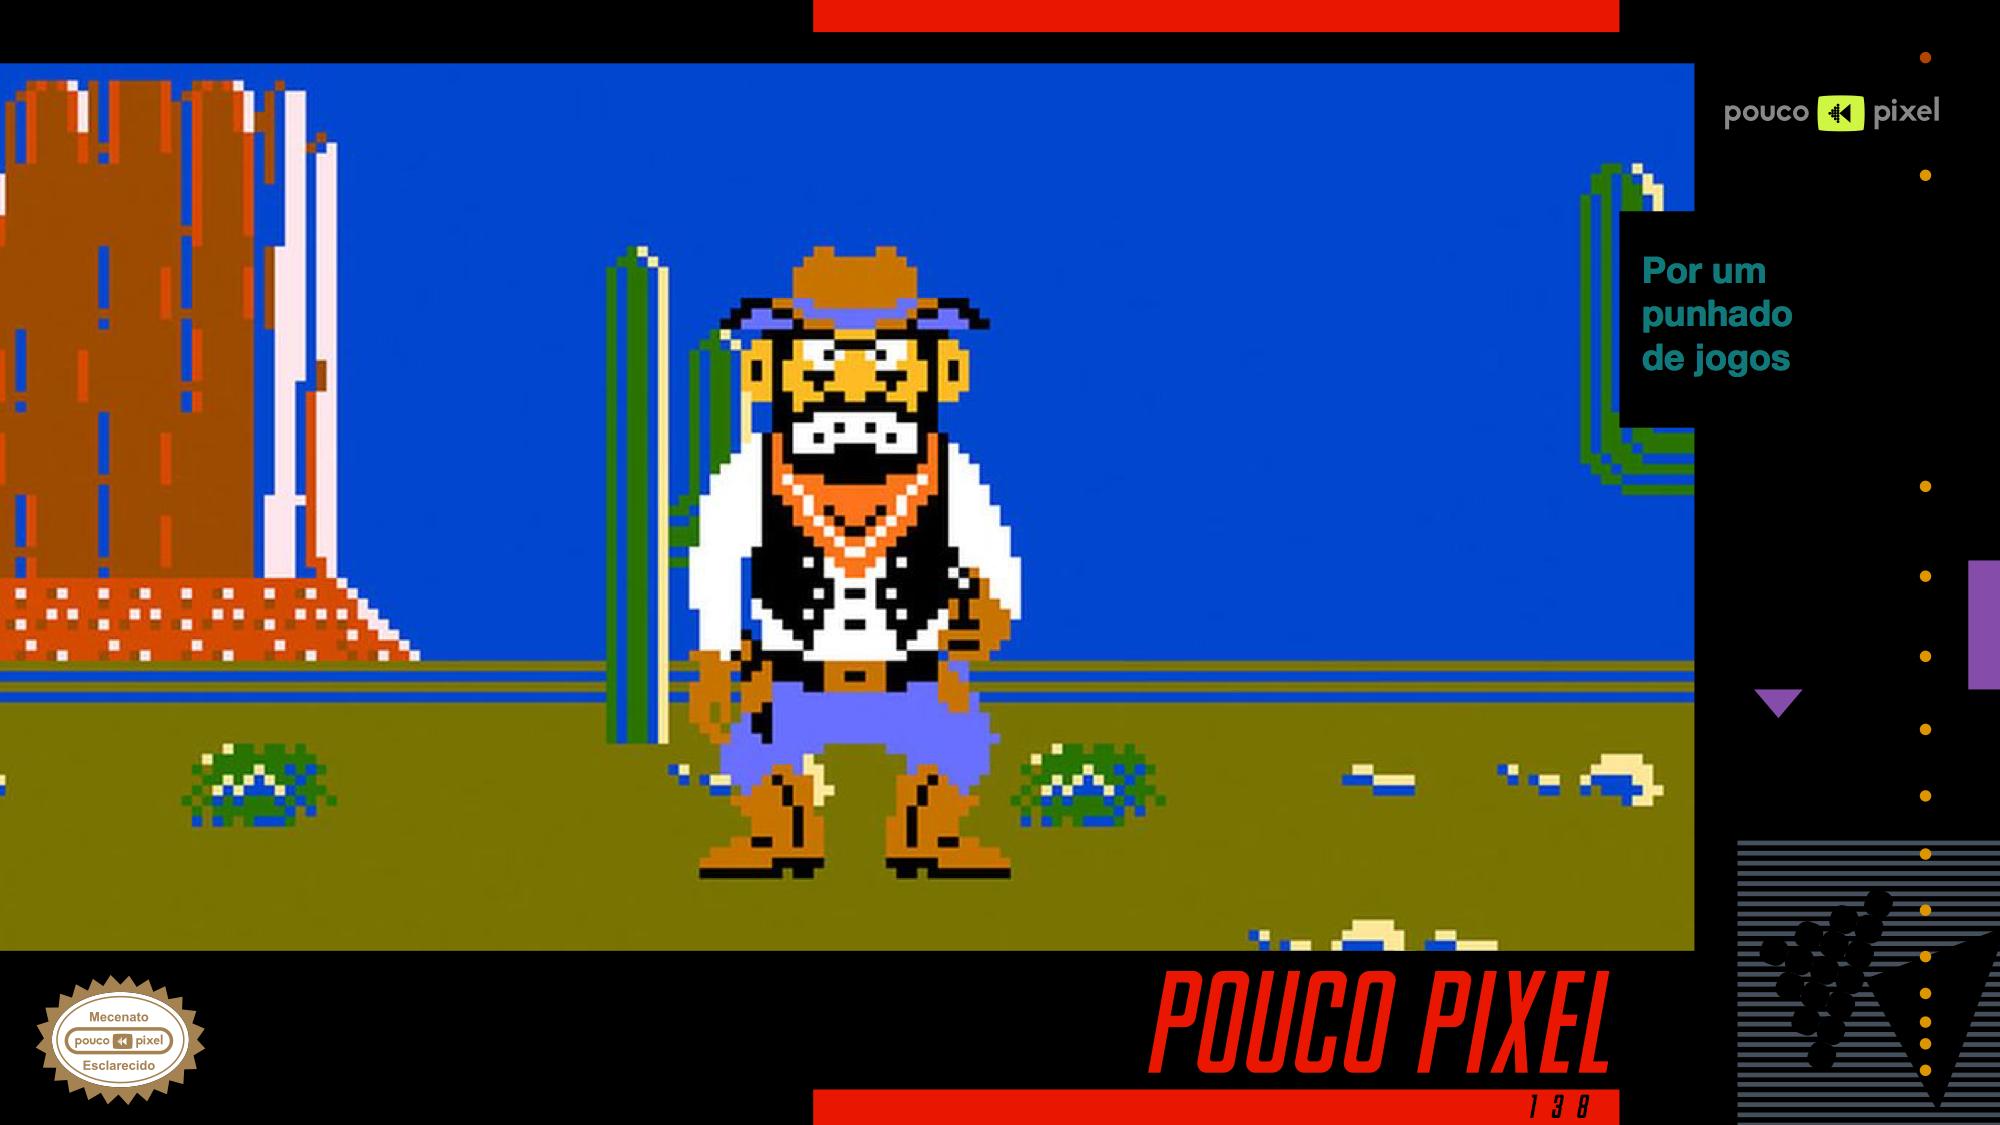 Pouco Pixel 138 – Por um punhado de jogos